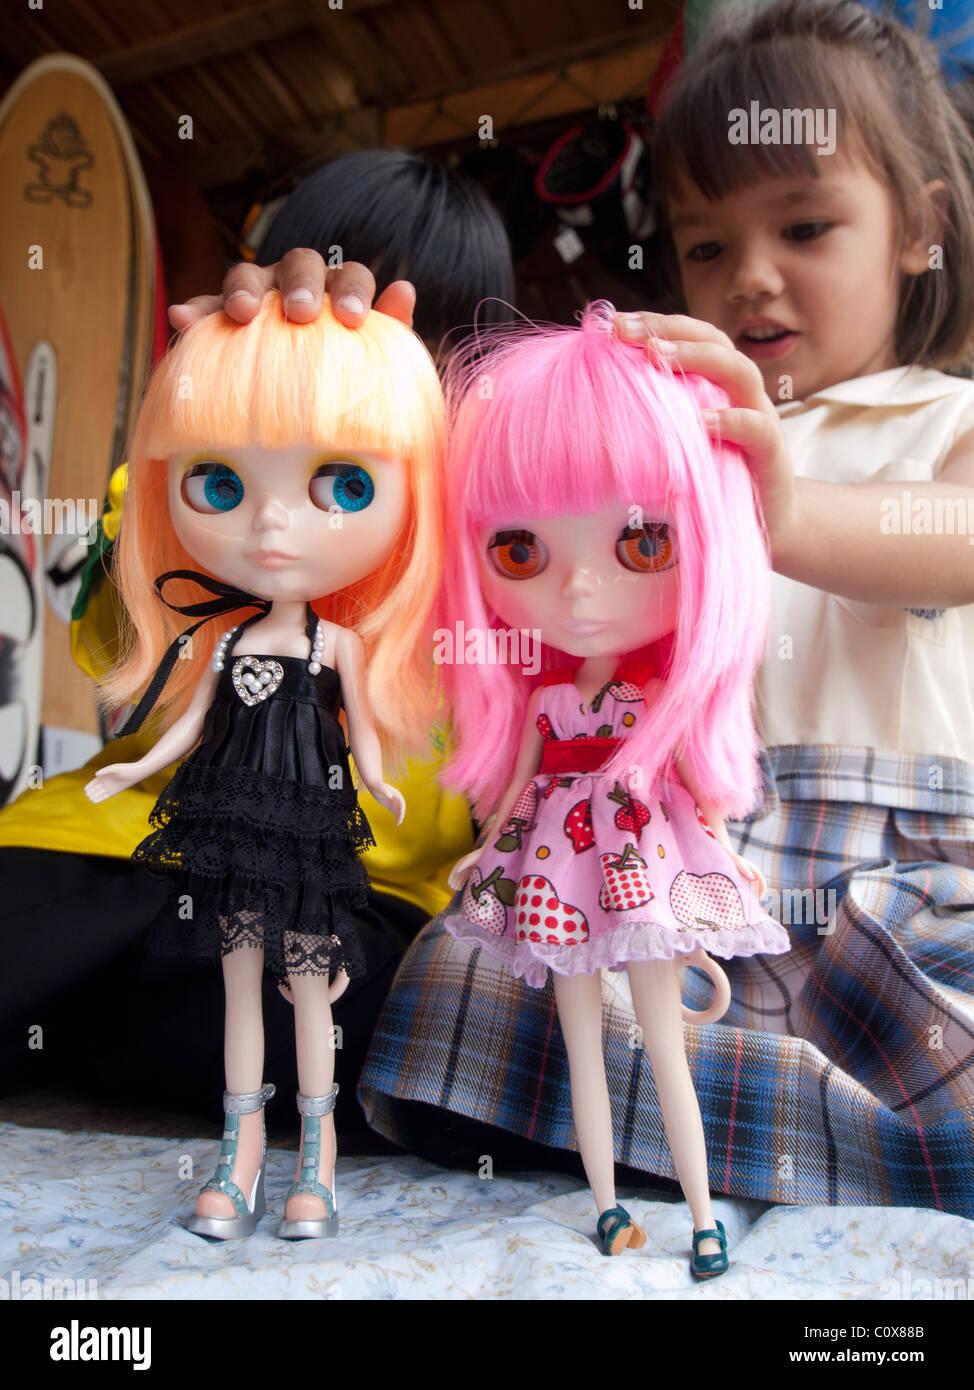 bambole blythe